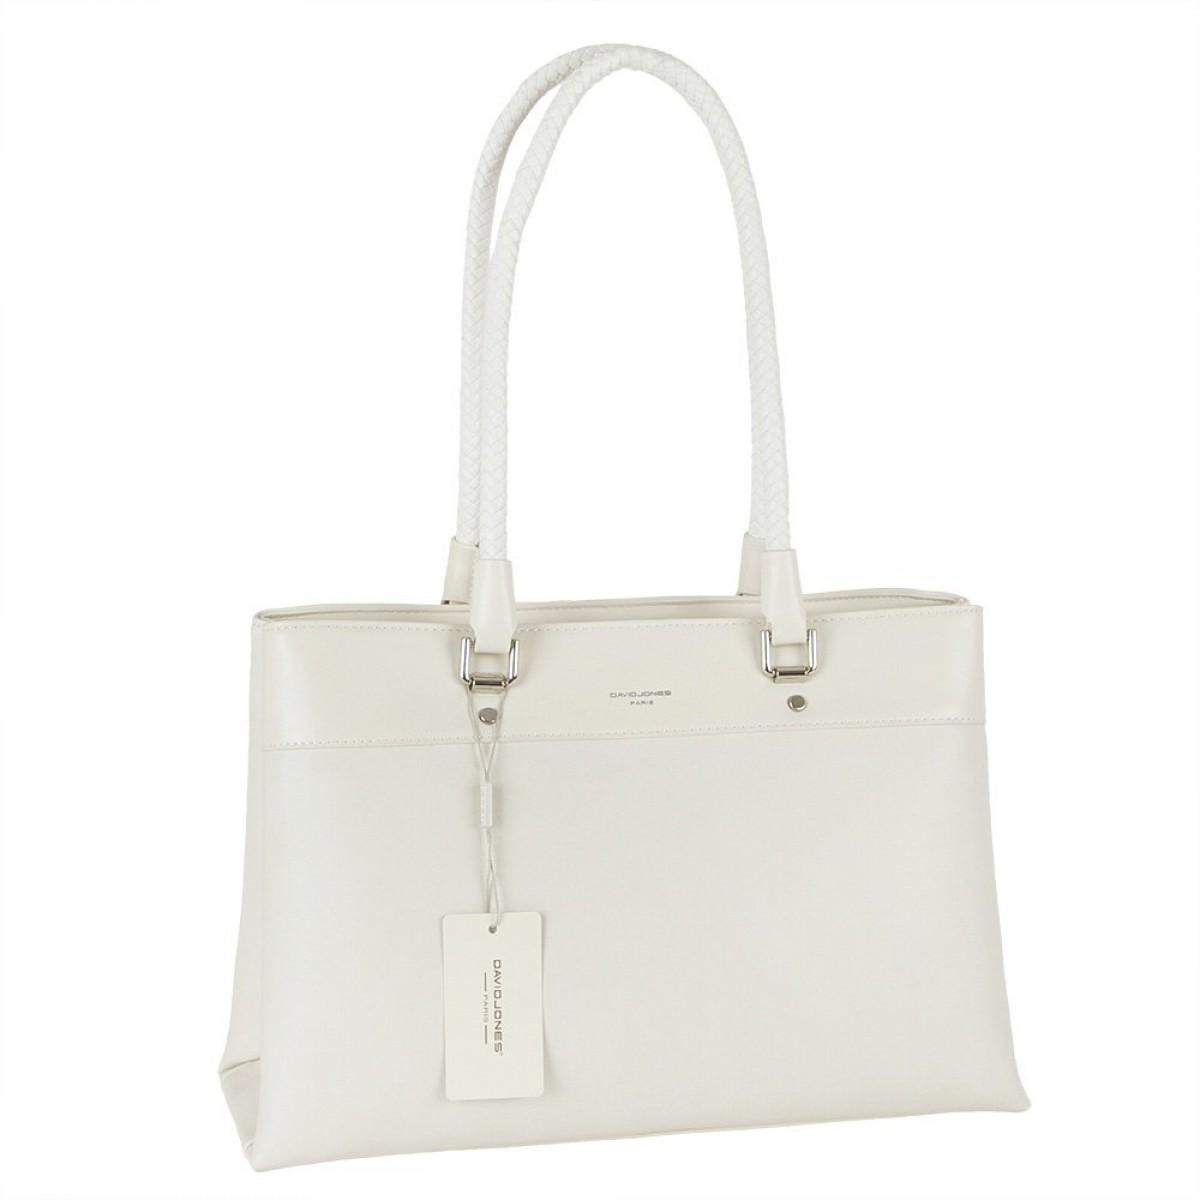 Жіноча сумка David Jones 6314-2 CREAMY WHITE